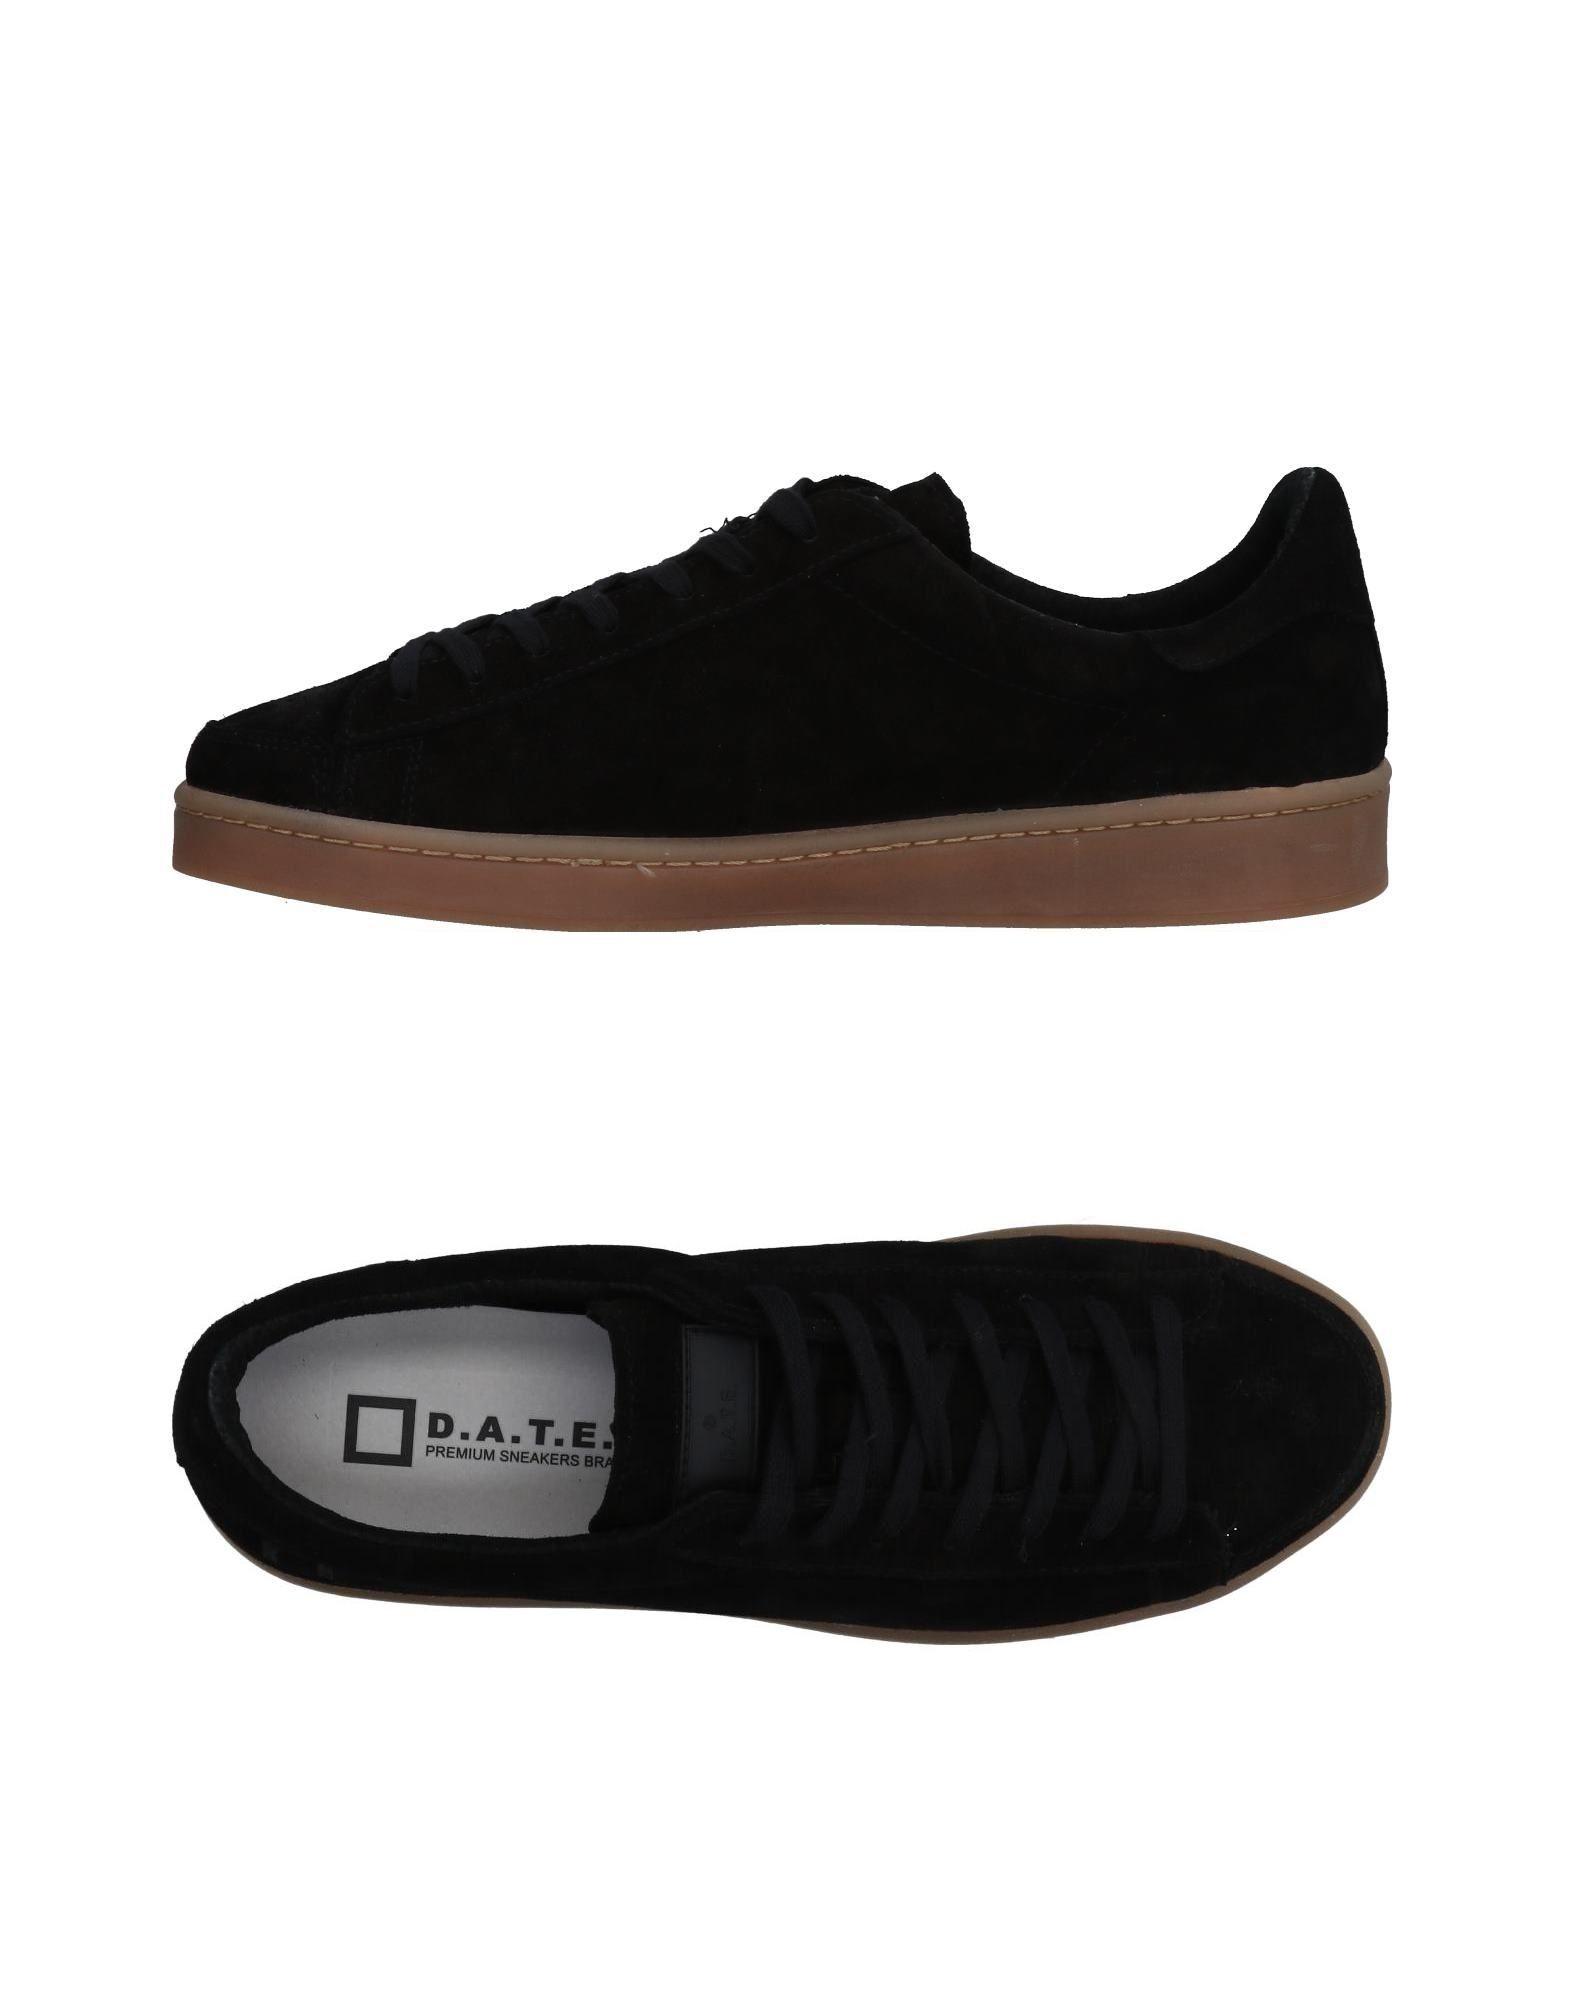 Moda Sneakers D.A.T.E. Uomo - 11471036WF